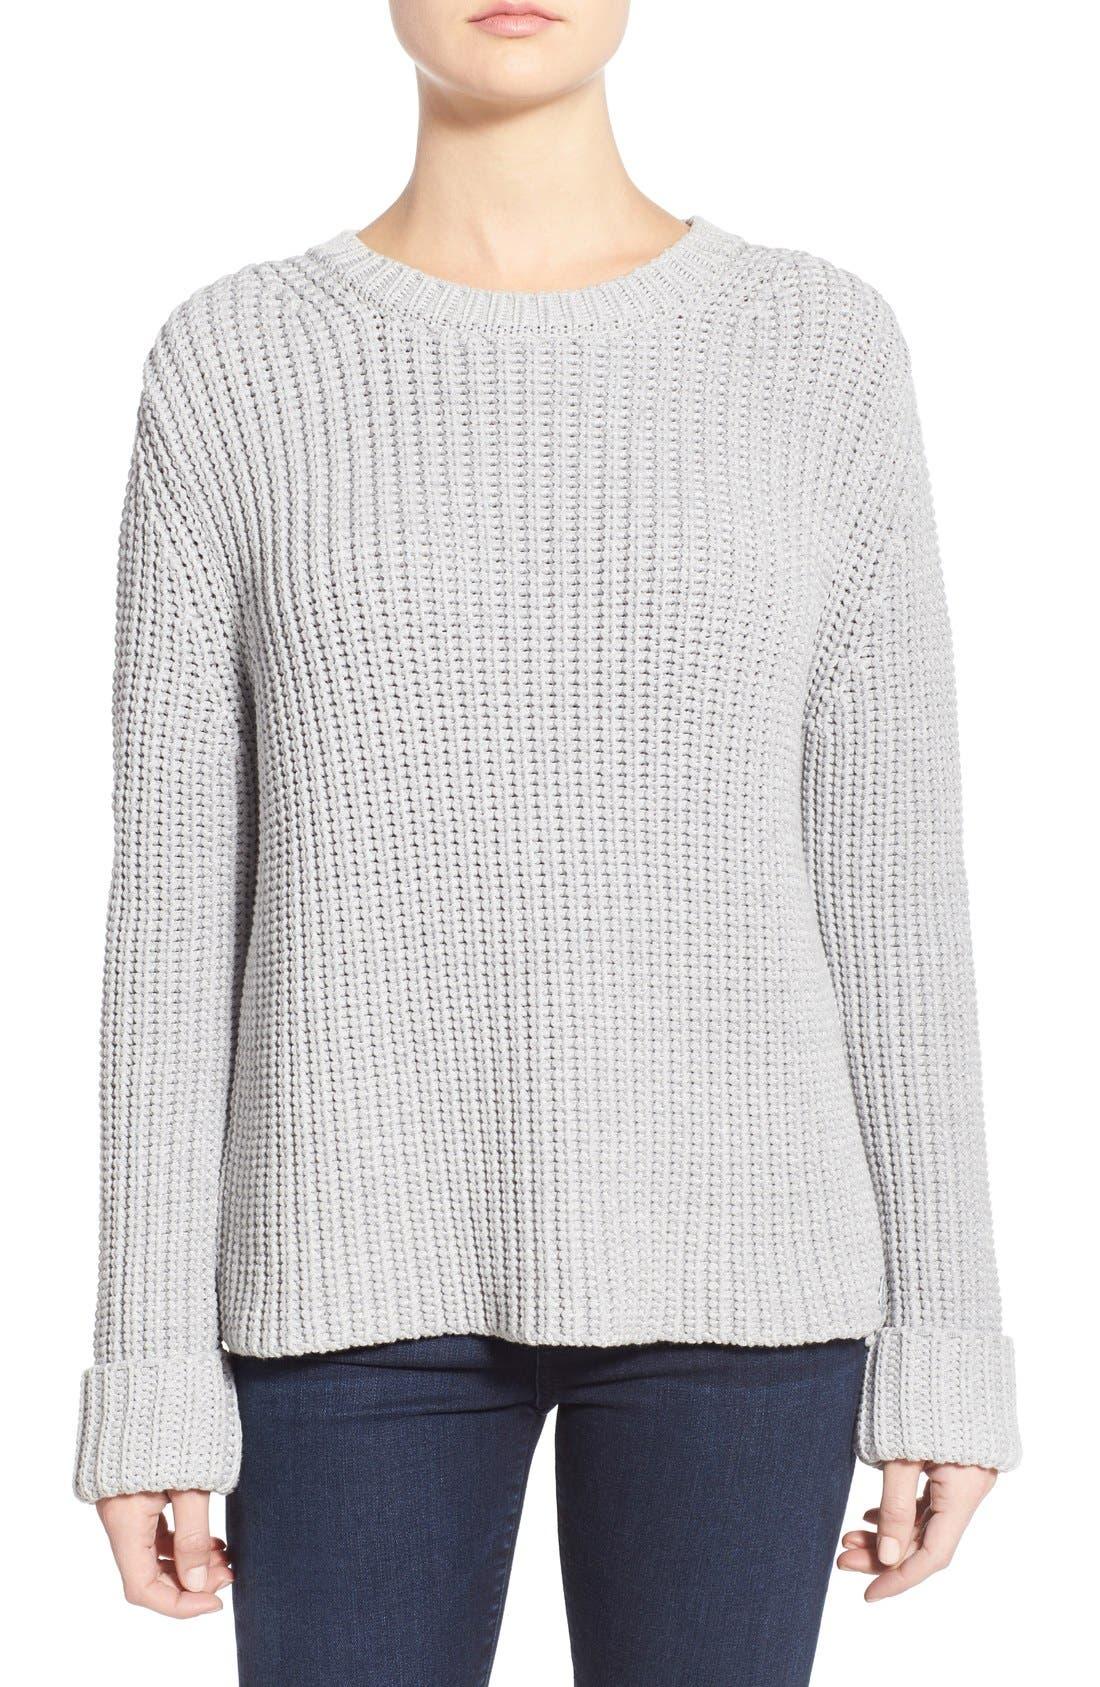 Alternate Image 1 Selected - Barbour 'Clove Hitch' Crewneck Sweater